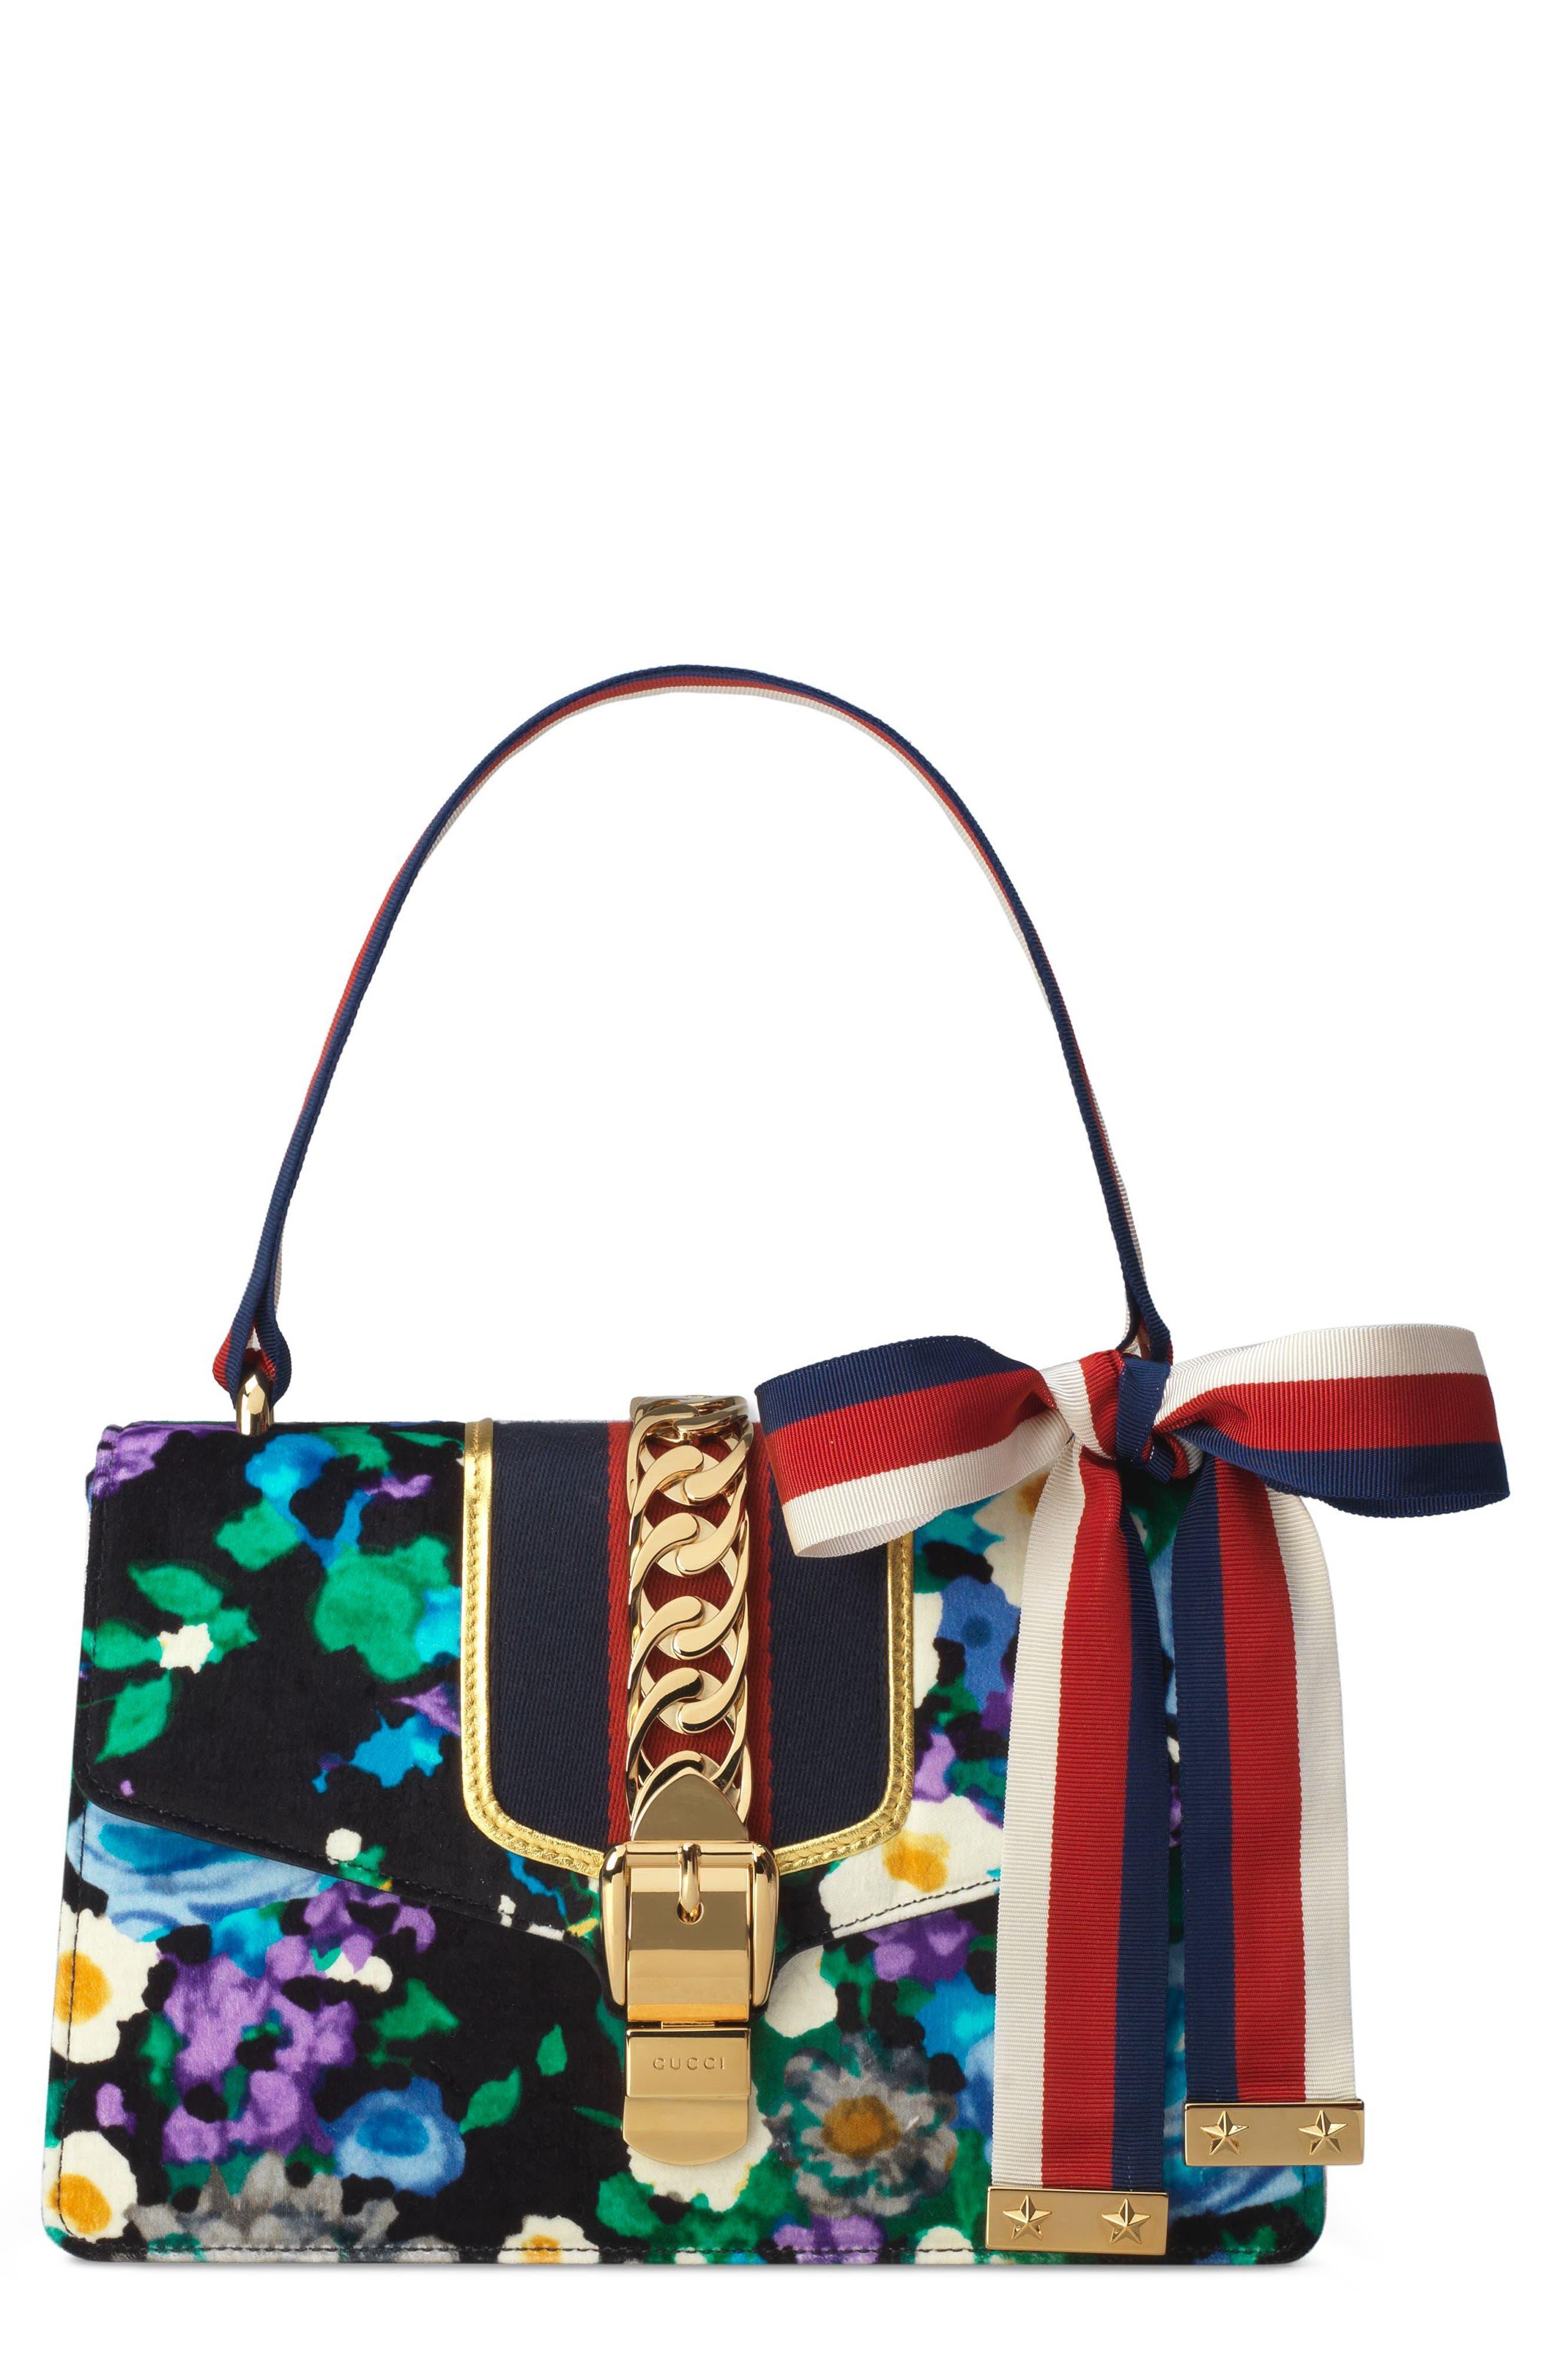 Small Floral Print Leather Shoulder Bag,                             Main thumbnail 1, color,                             Black/ Blue Red Blue